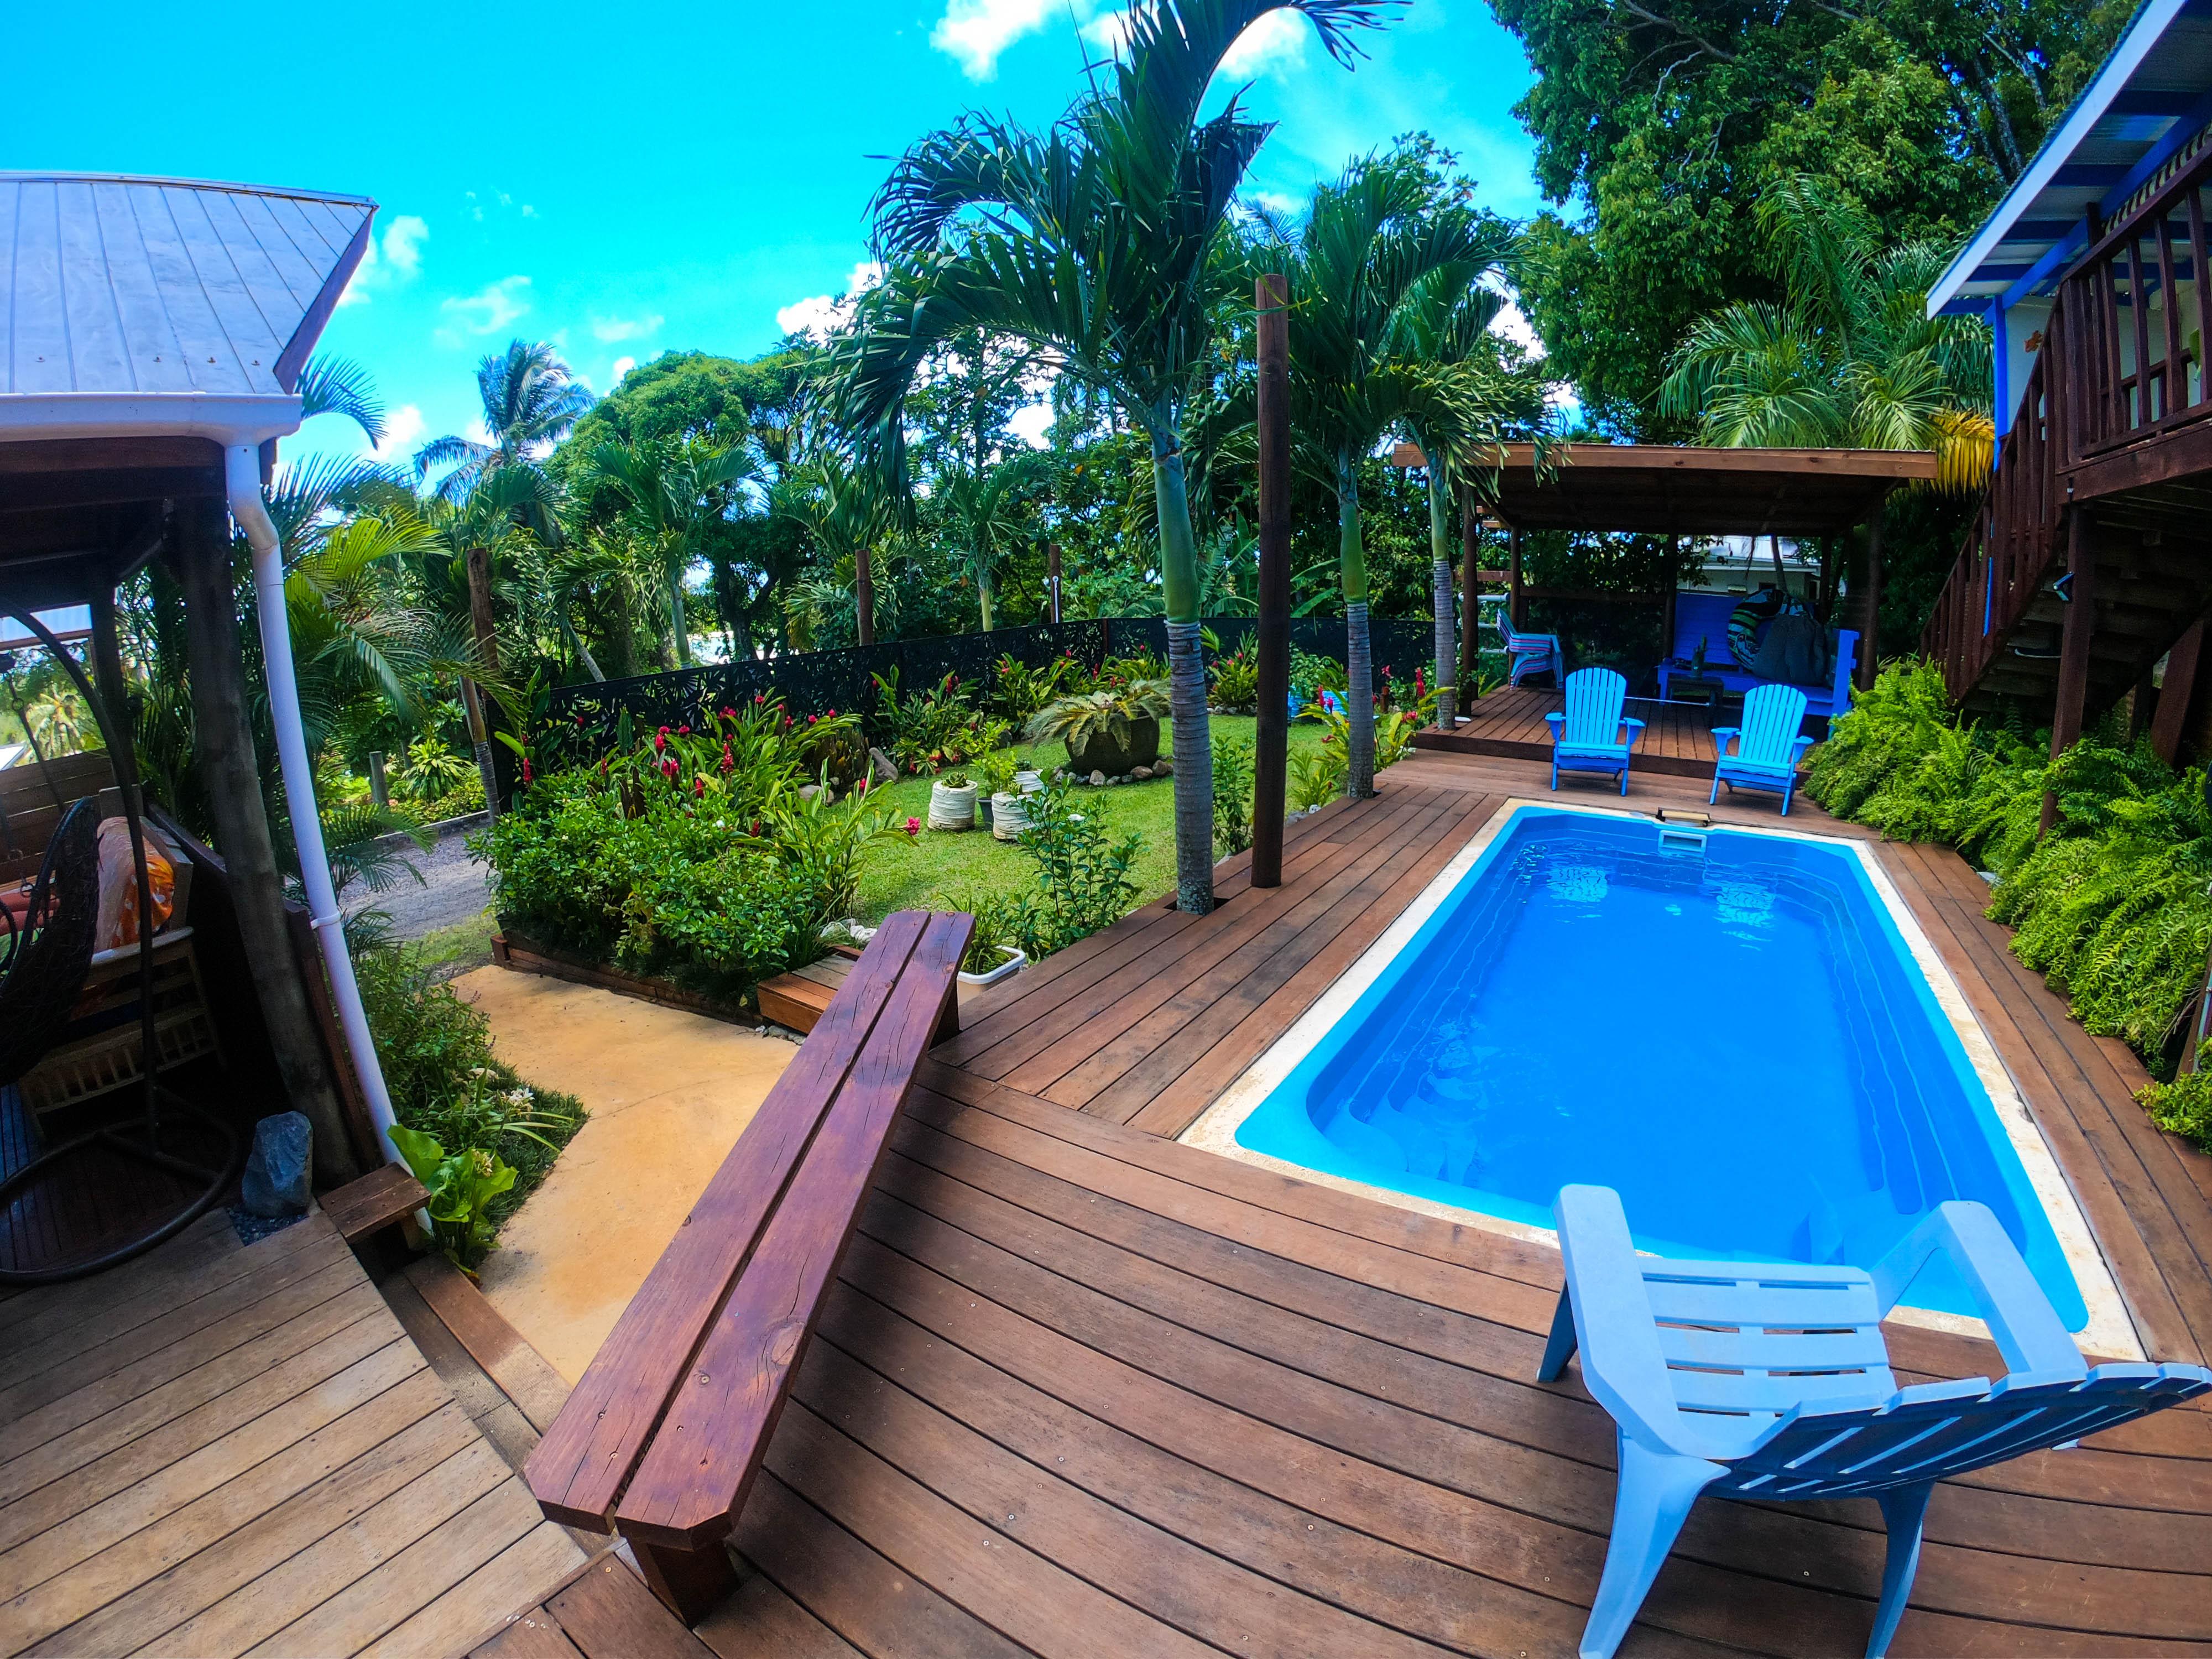 Plunge pool & pool hut, garden